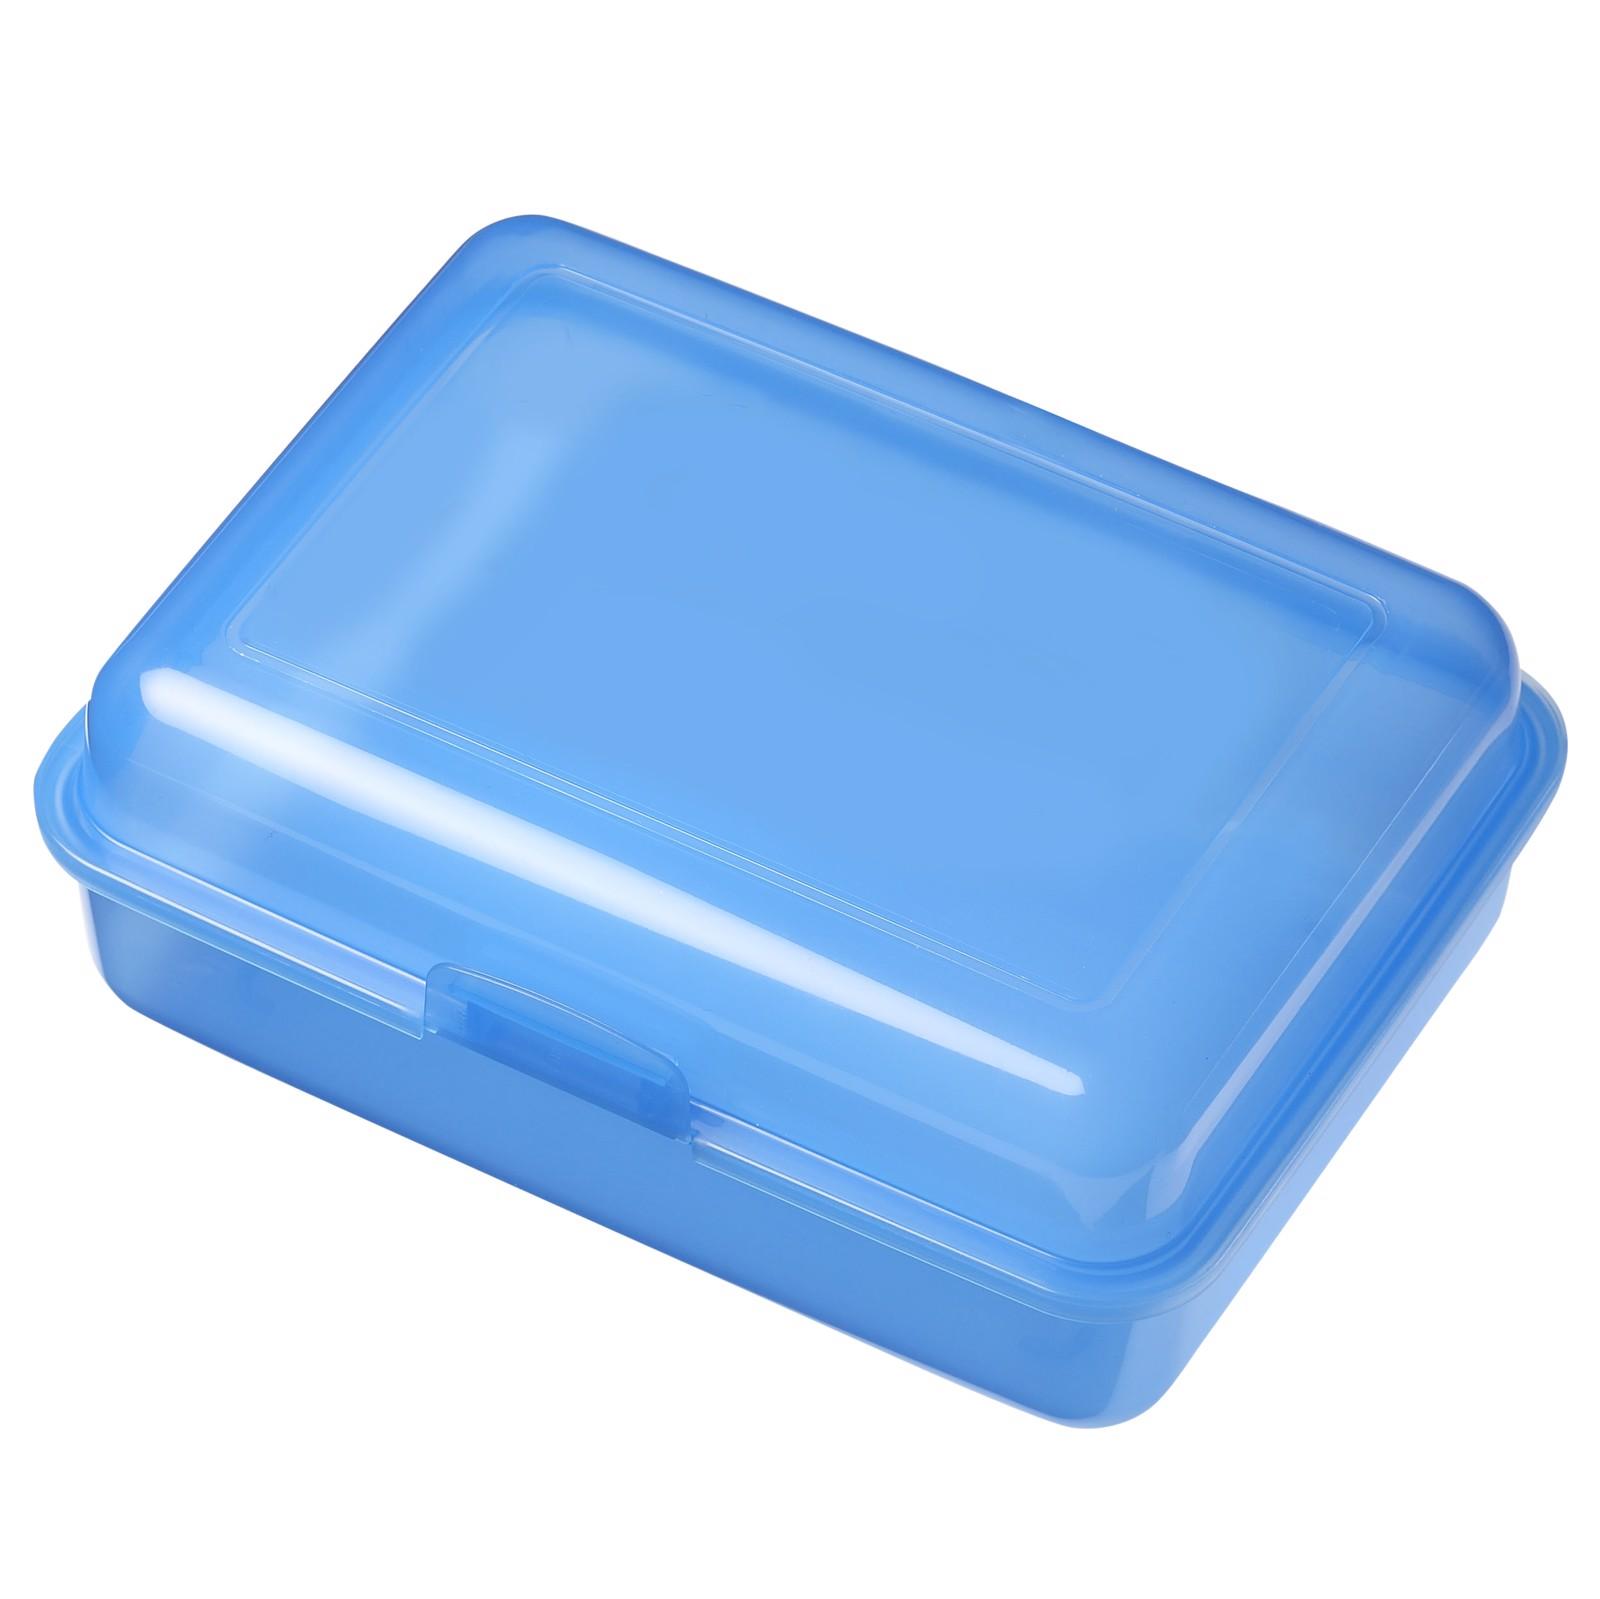 "Storage Box ""School Box"" Large, High-Gloss - Trend-Blue Pp"